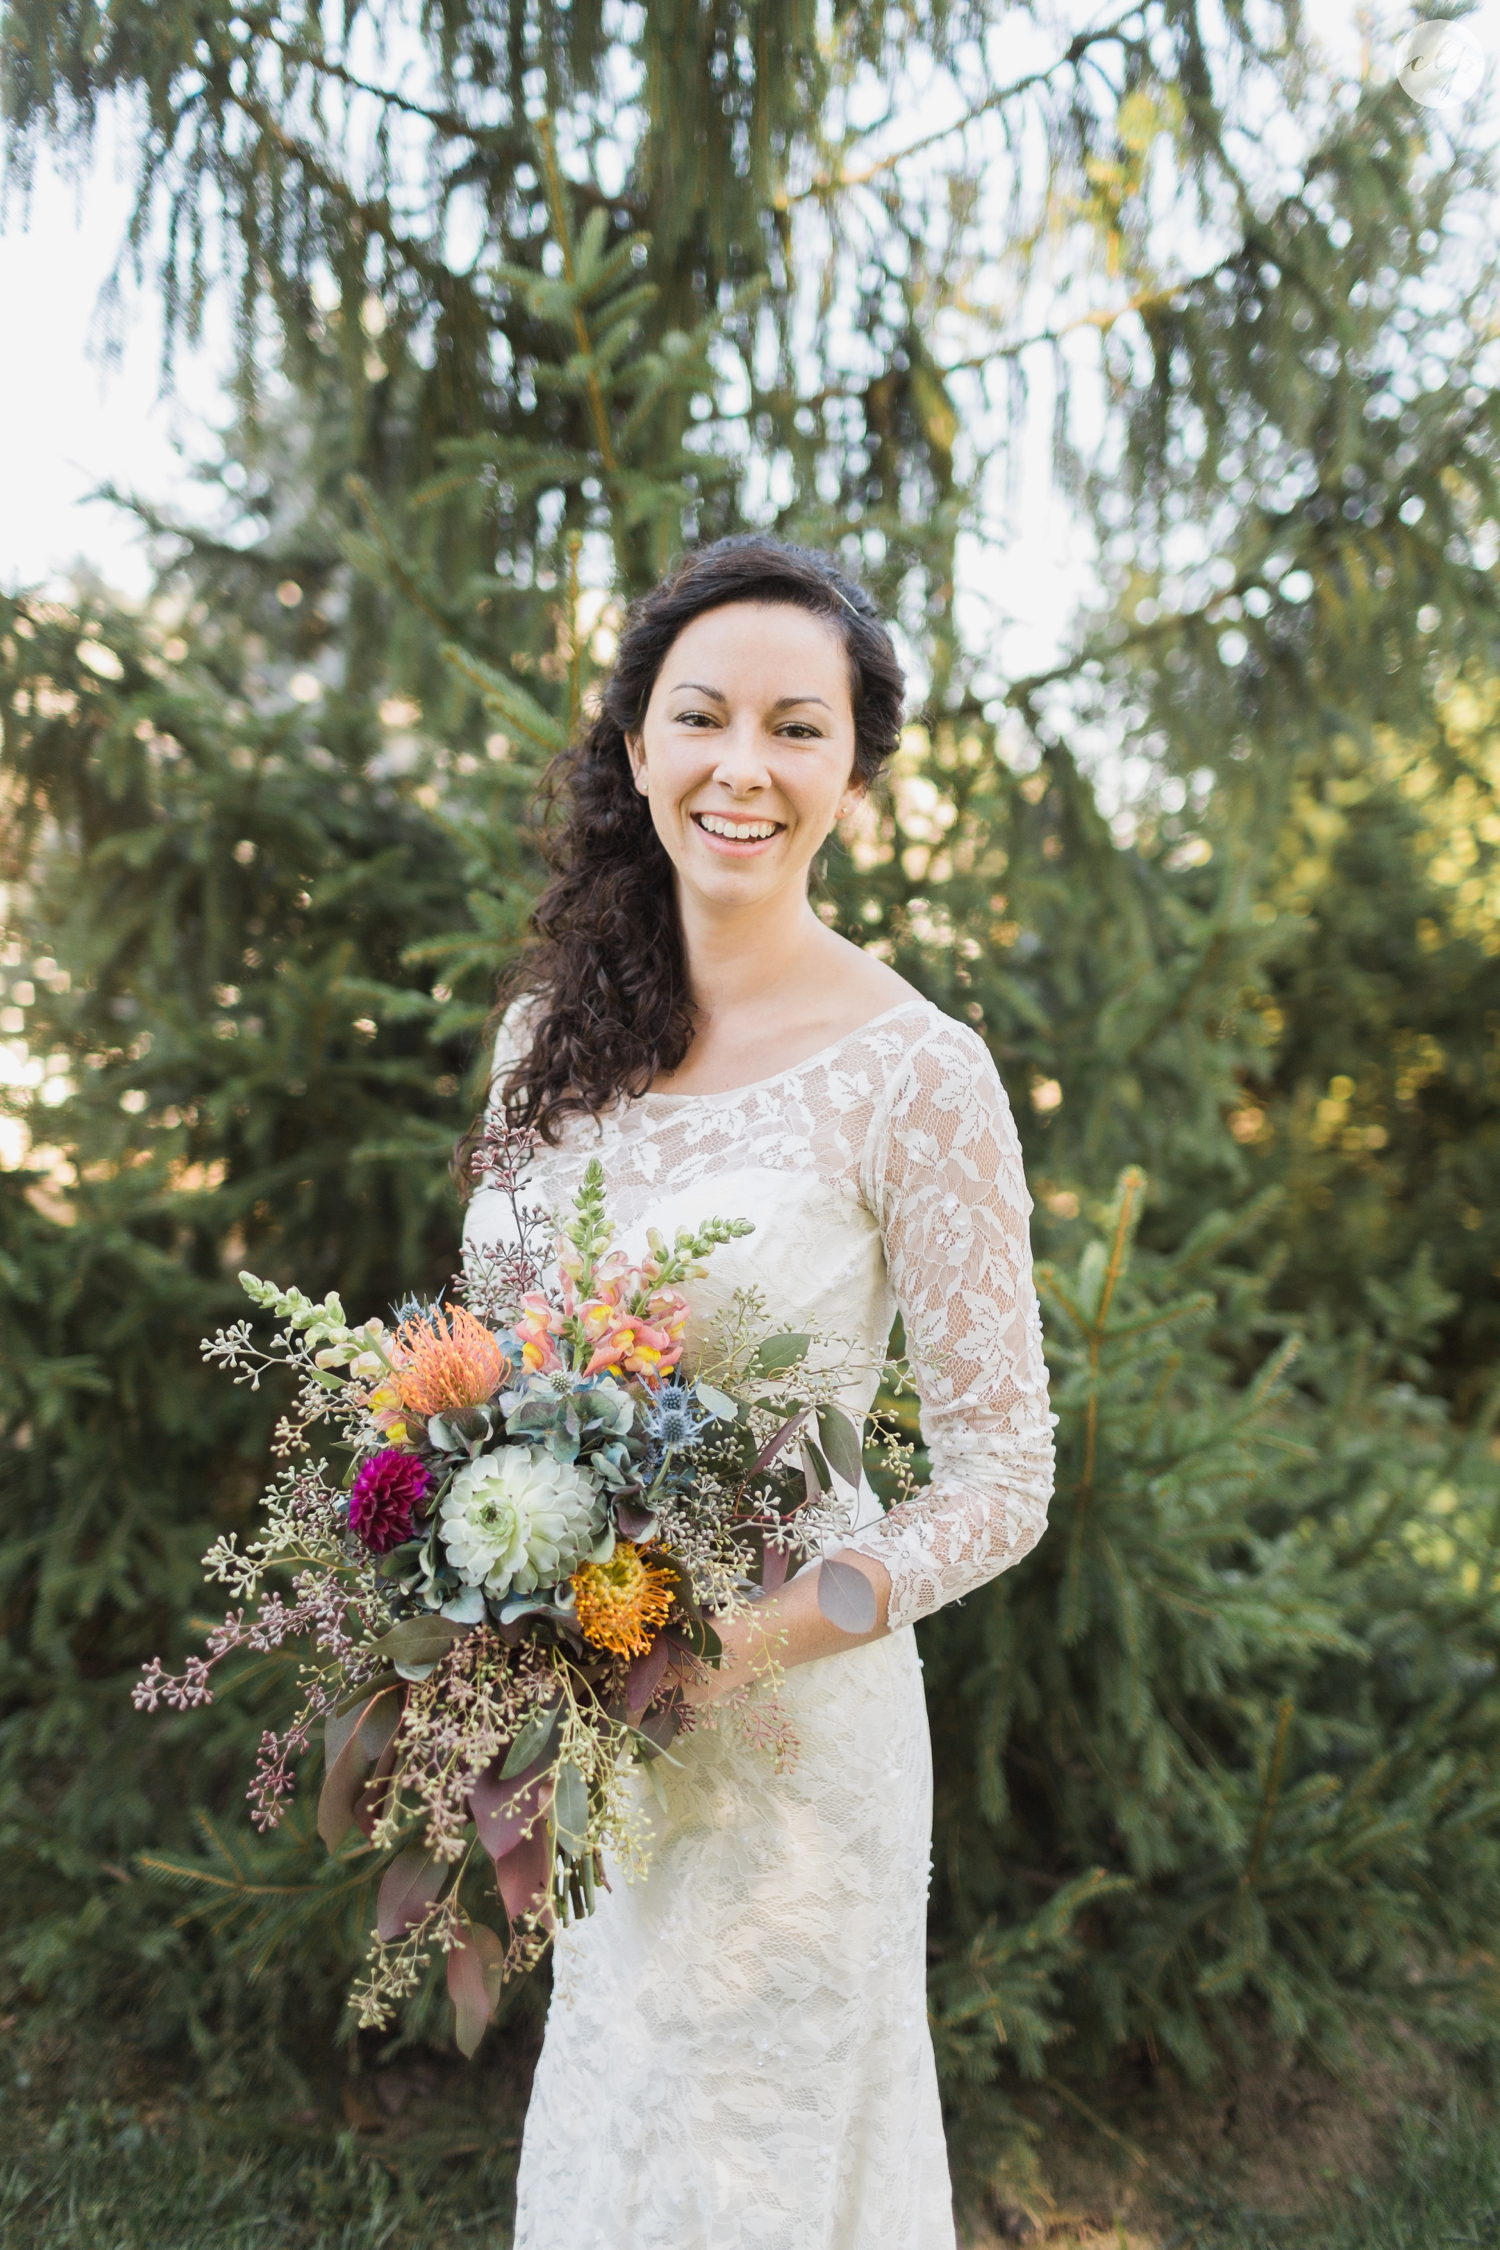 Outdoor-Wedding-in-the-Woods-Photography_4167.jpg